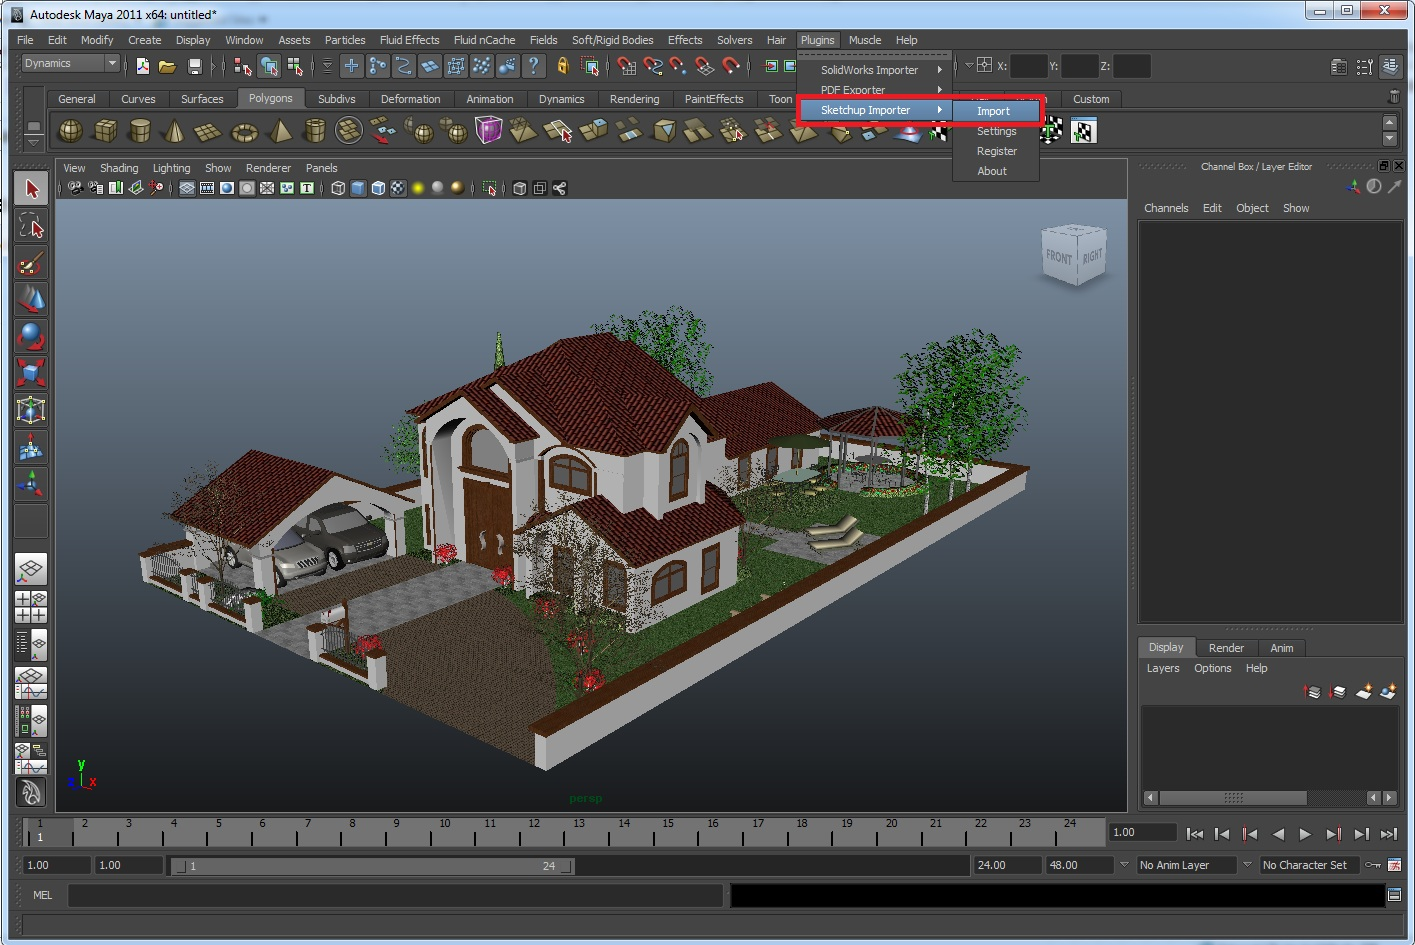 autodesk maya 2011 free trial download